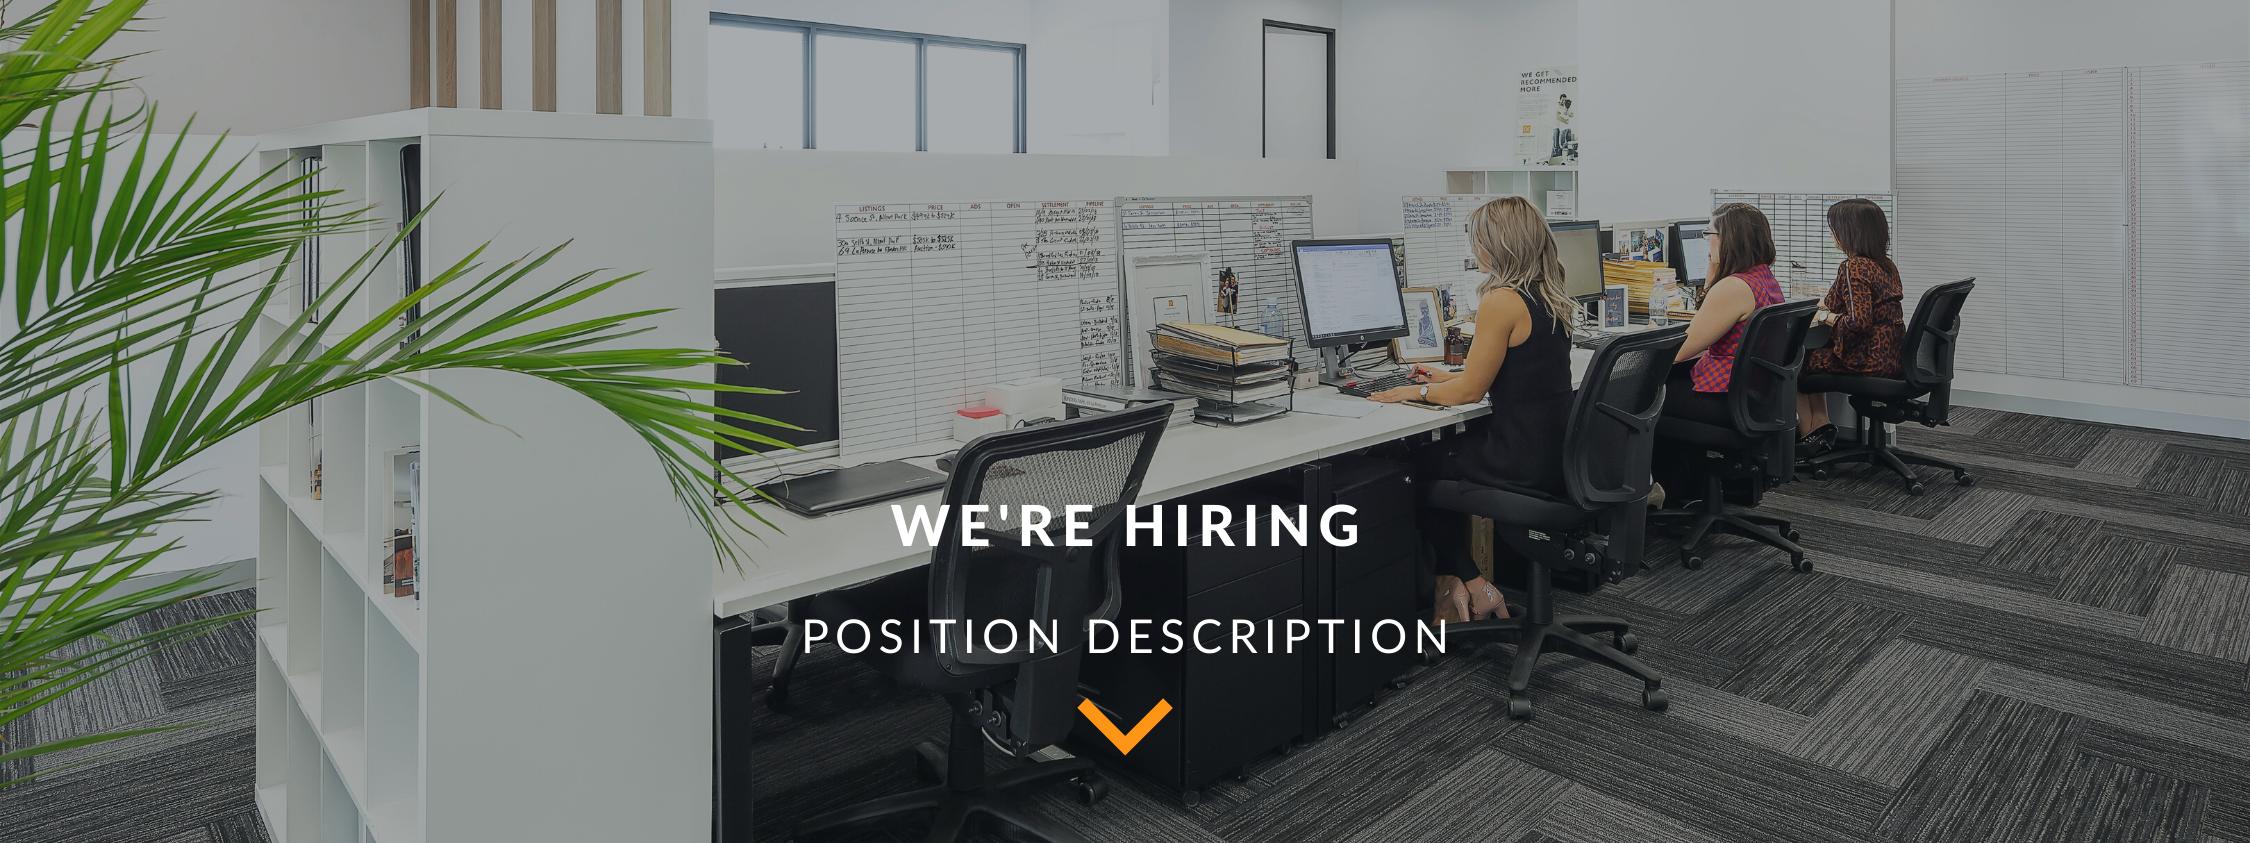 ouwens-casserly-were-hiring-position-description